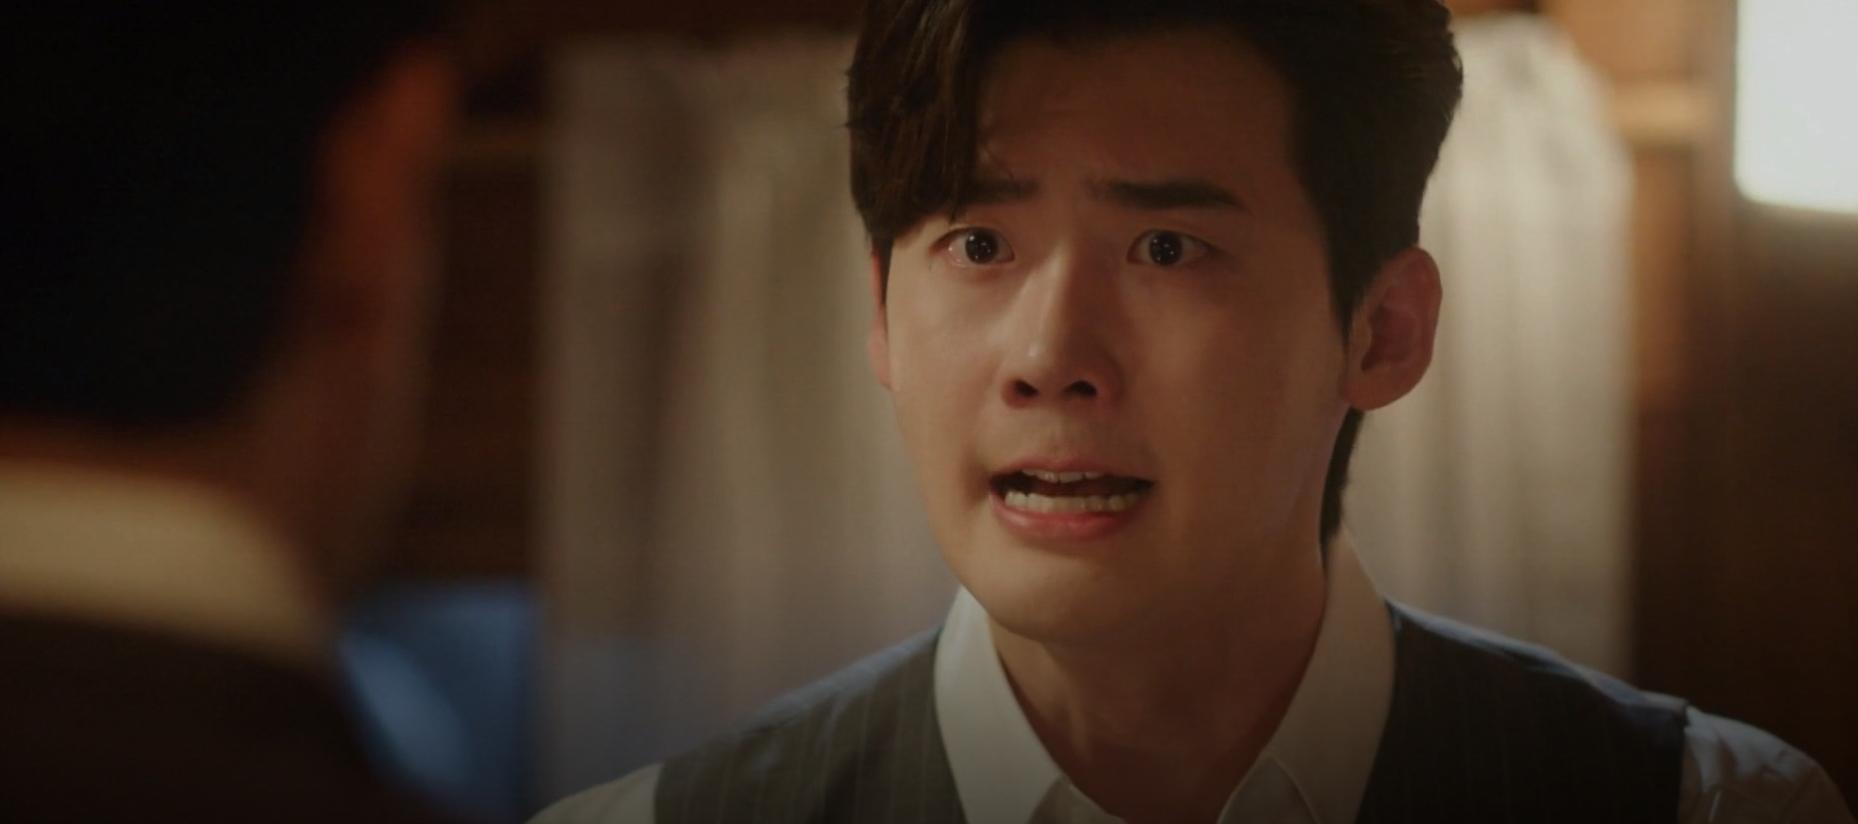 lee jongsuk s heartbreaking scene got viewers about to cry in